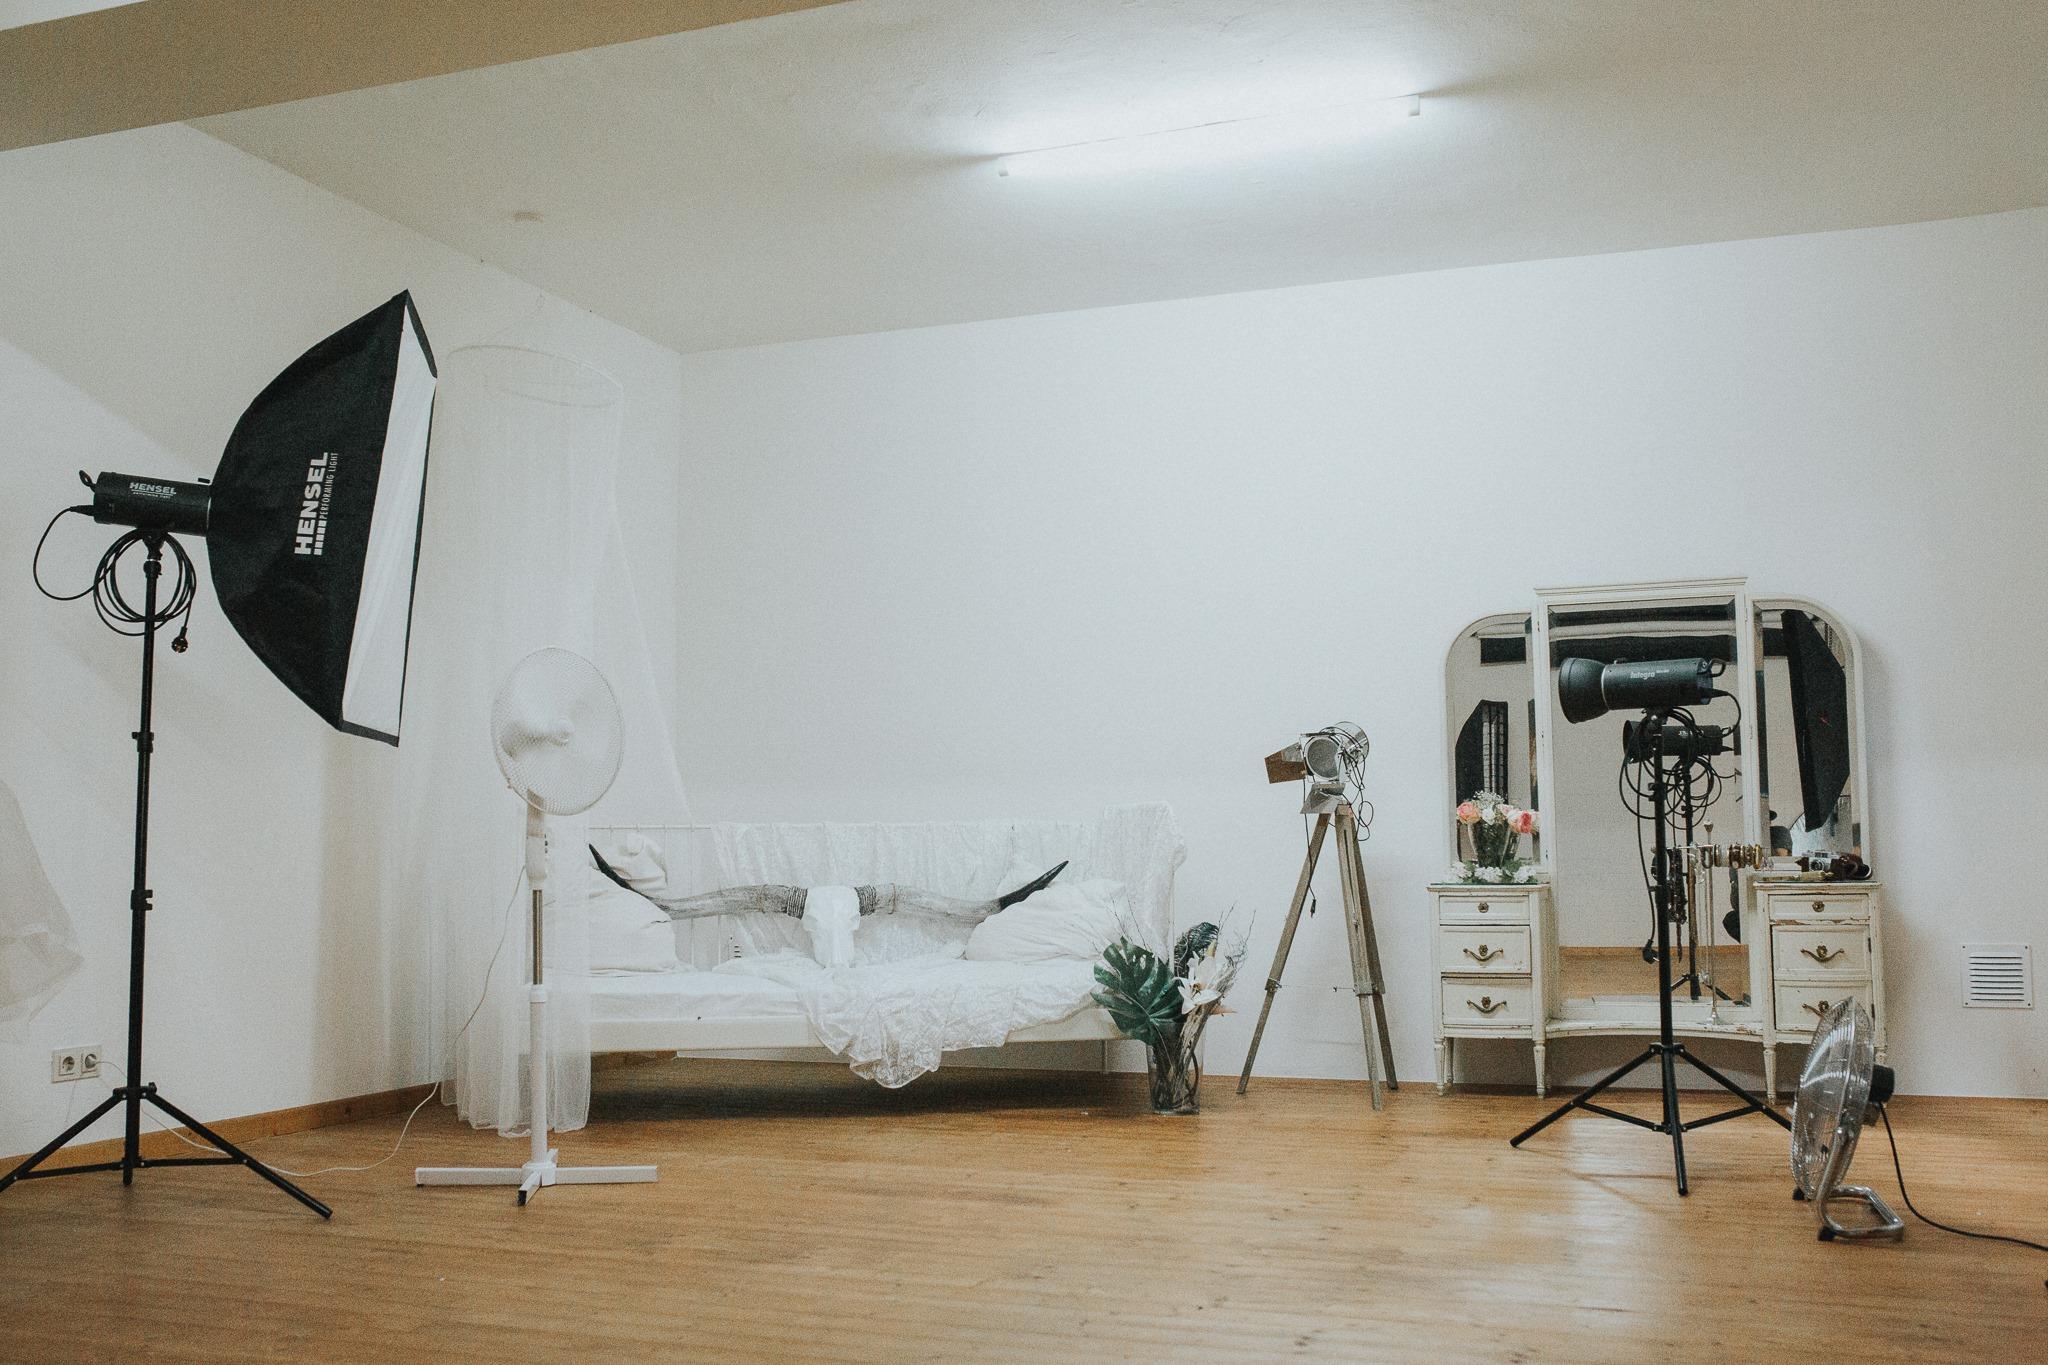 fuxstudio-köln-mietstudio-02.jpg